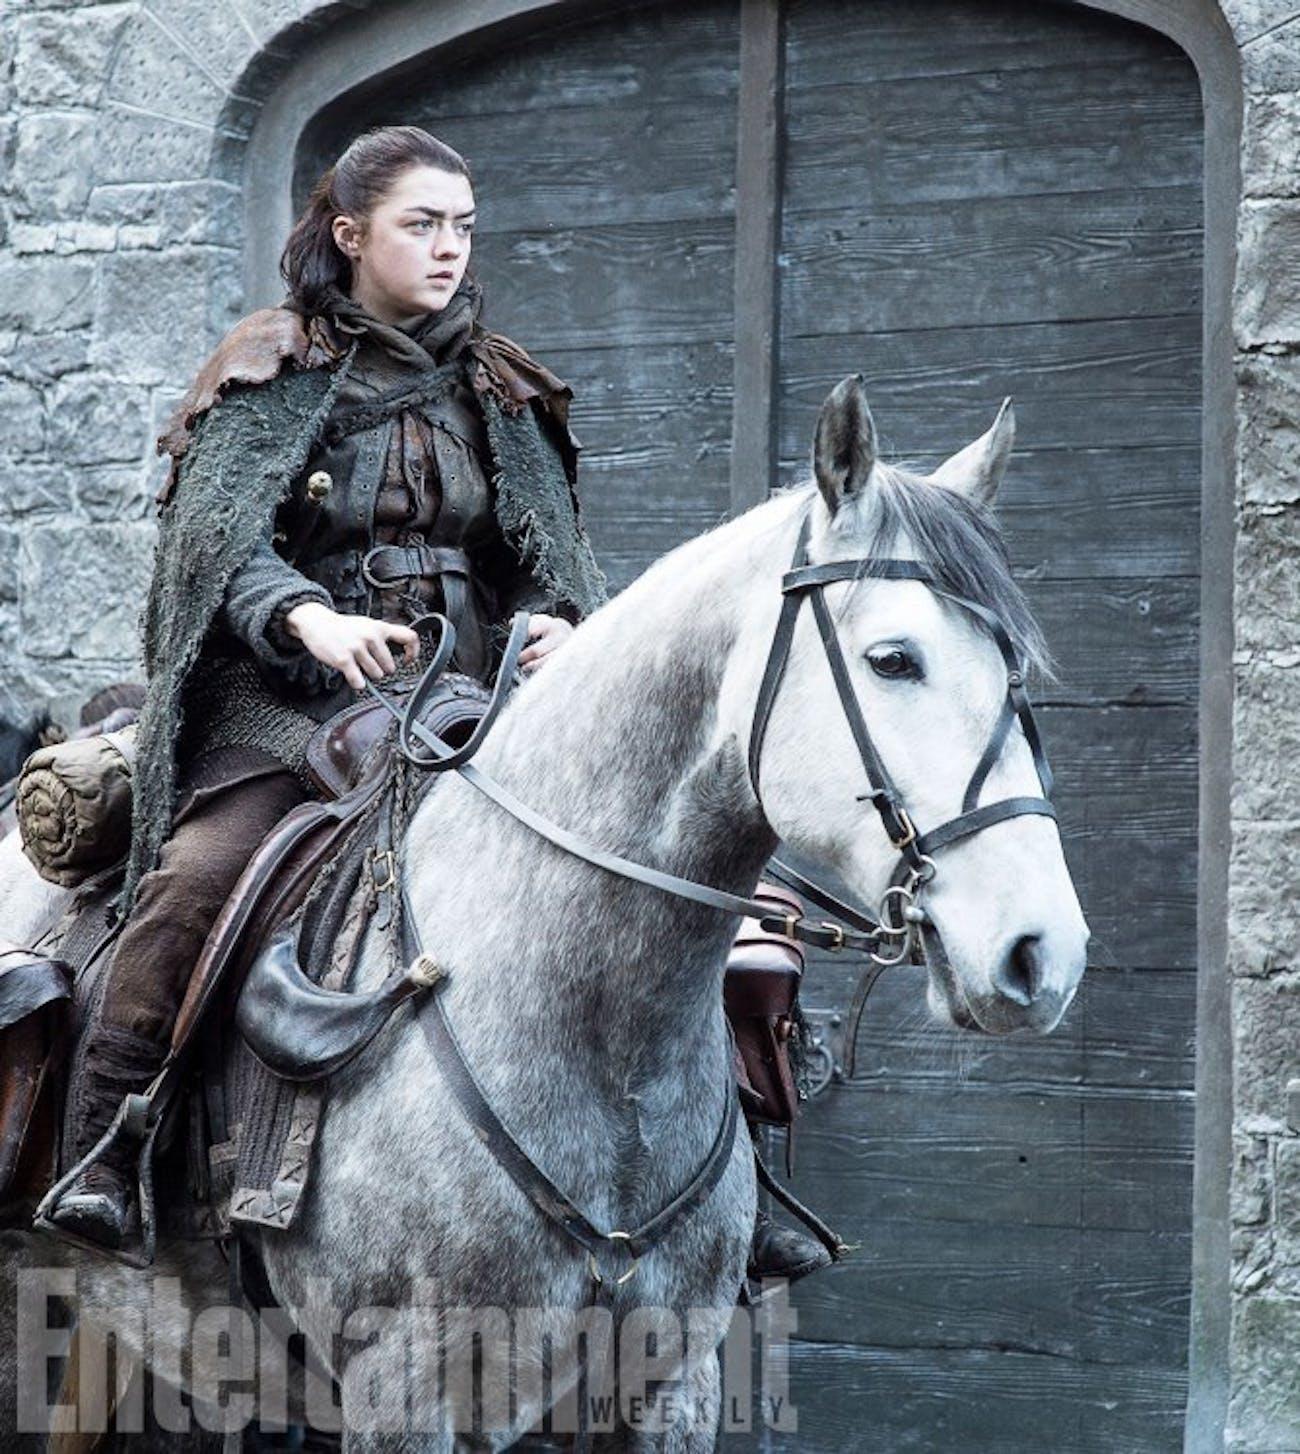 Maisie Williams in 'Game of Thrones' Season 7